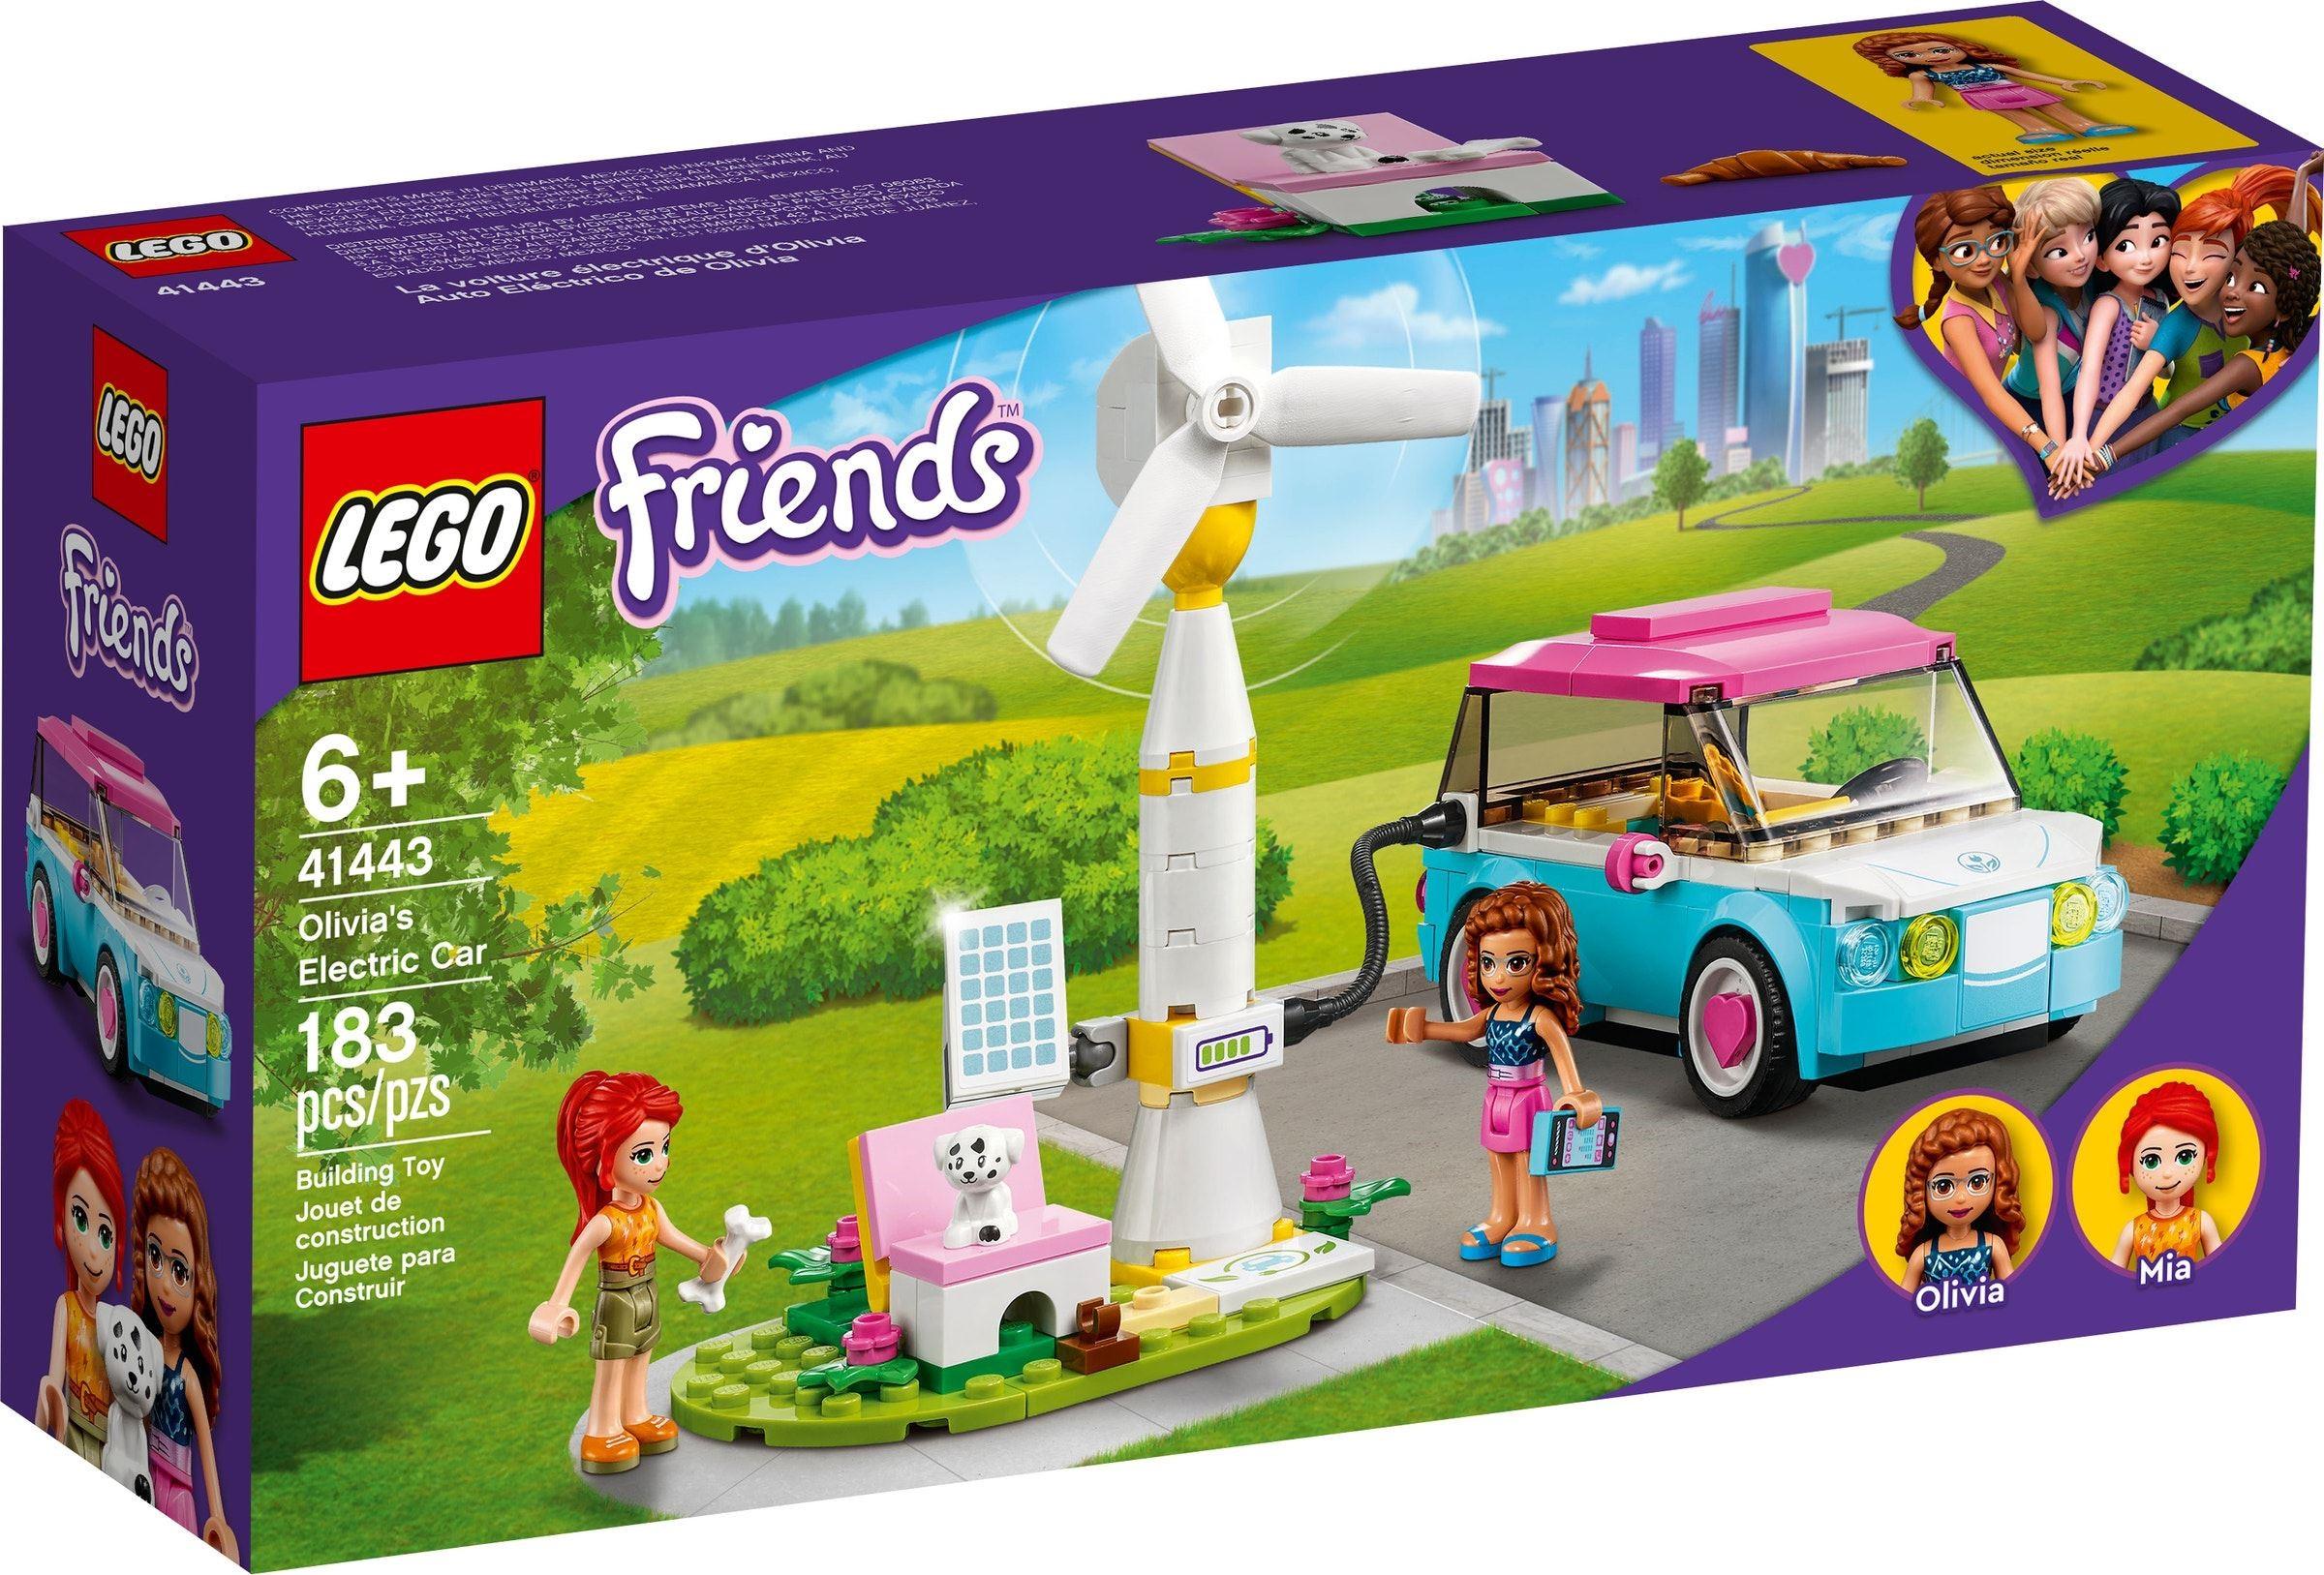 LEGO Friends - Olivia's Electric Car (41443)